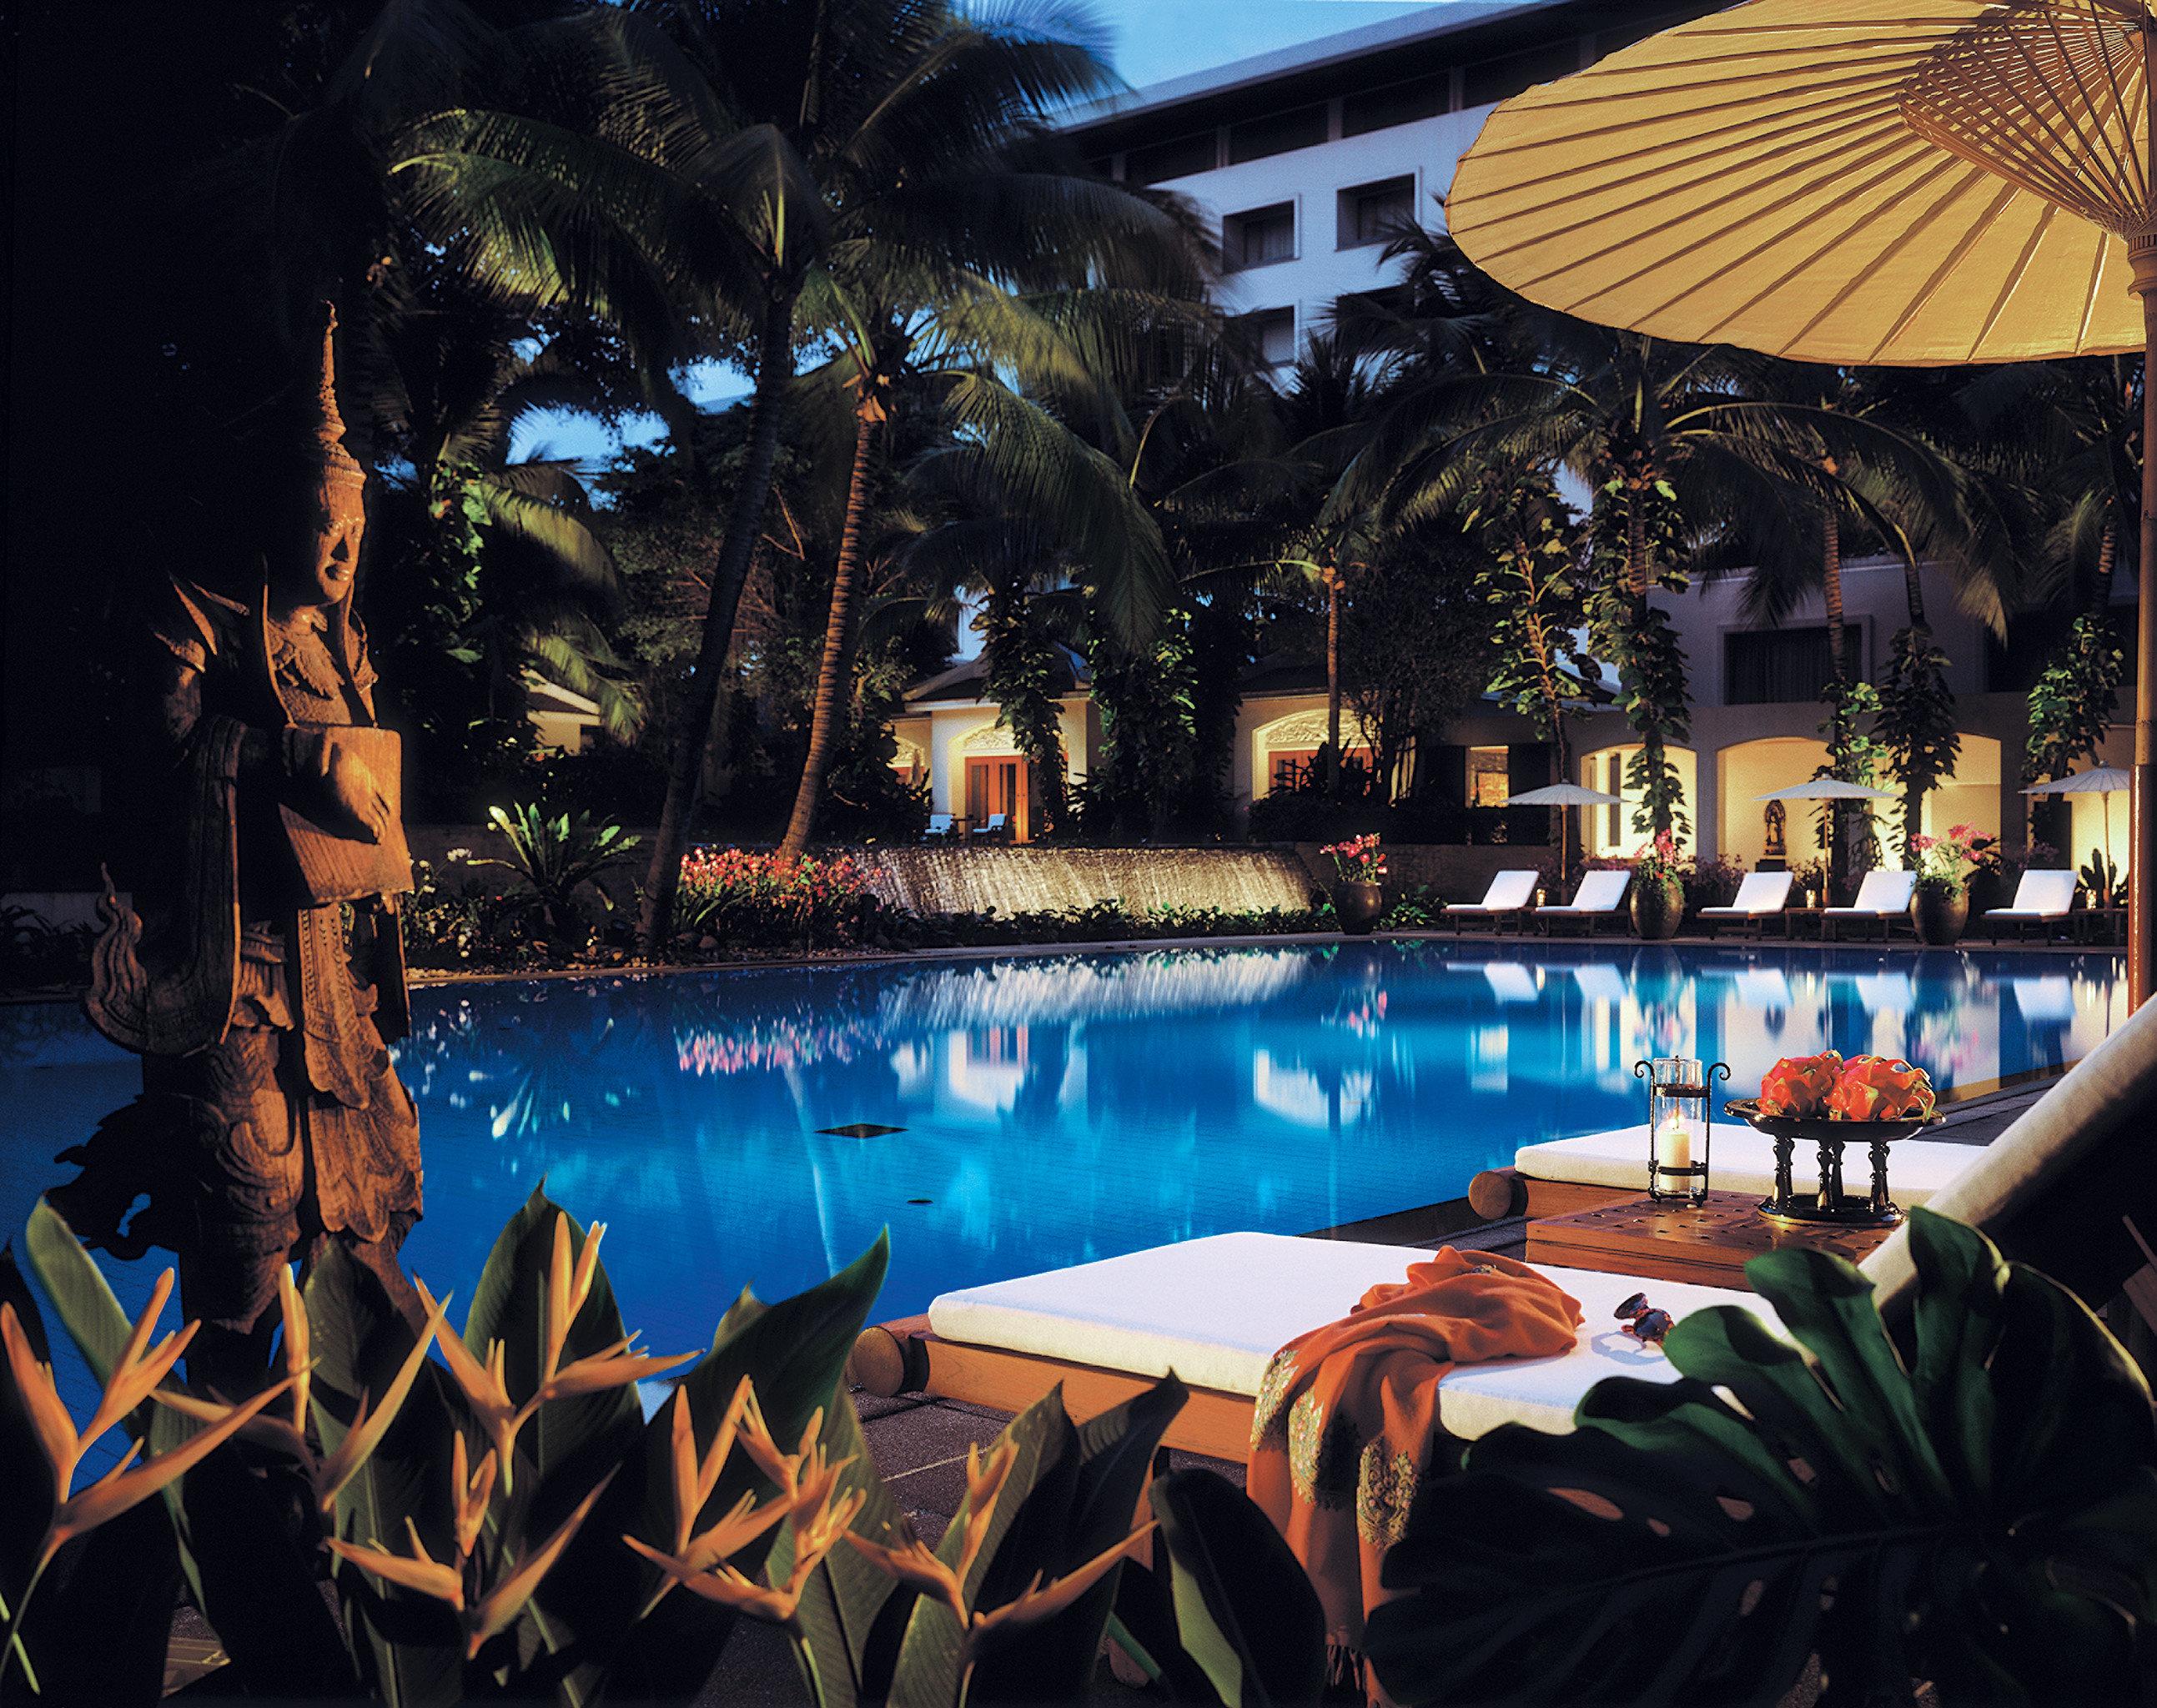 City Patio Pool umbrella Resort swimming pool